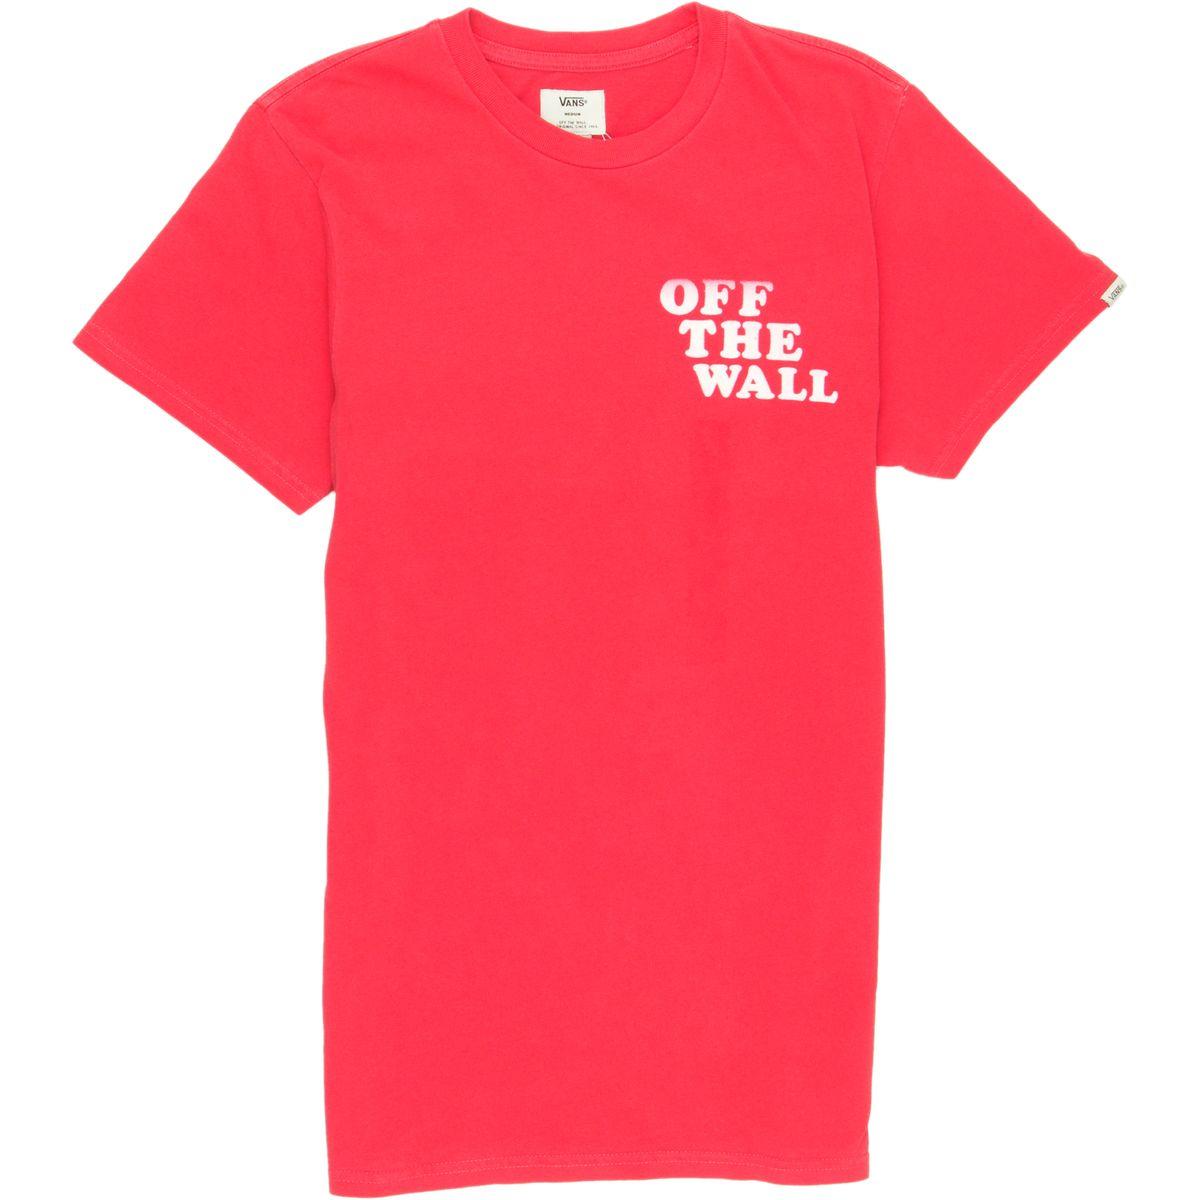 Vans OTW Flock T-Shirt - Short-Sleeve - Men